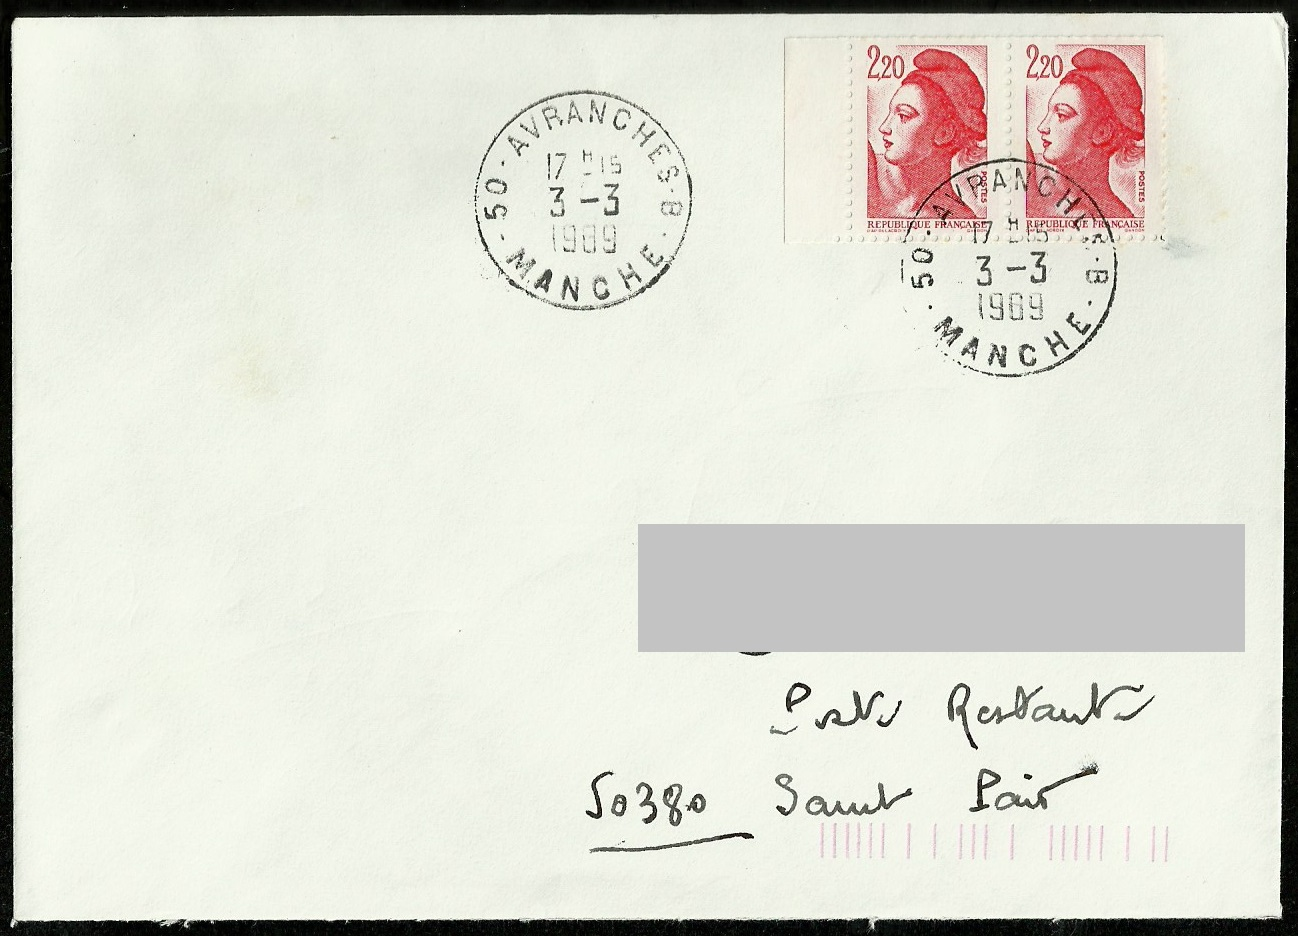 courrier en poste restante